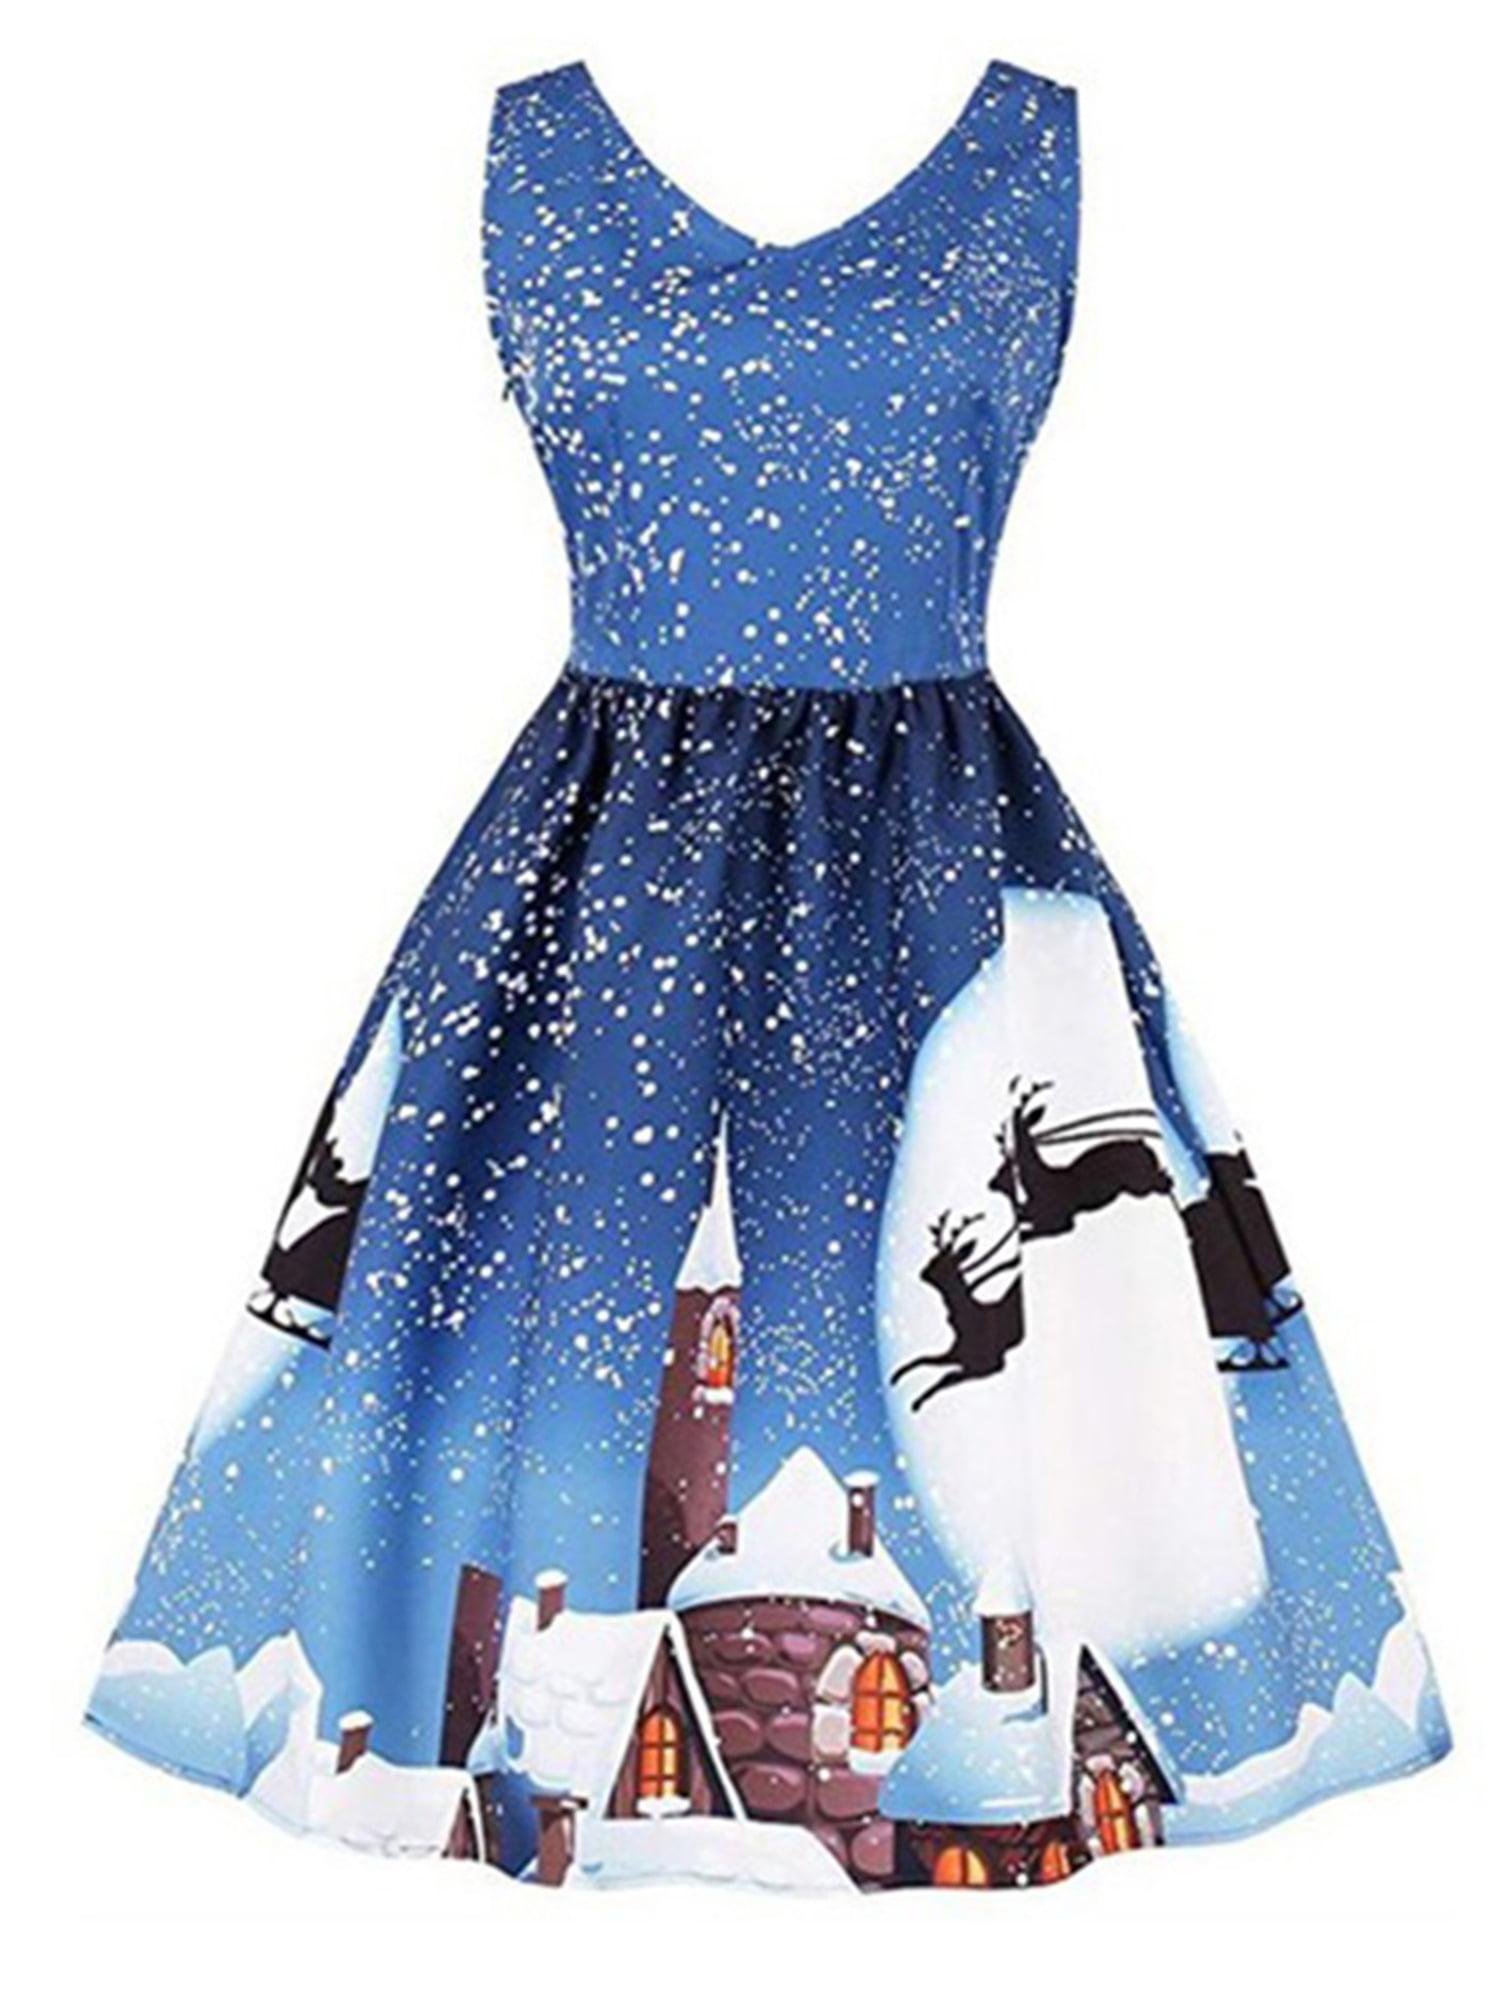 Womens Designer Vintage Party Christmas Dress Xmas Costume Skater Swing Dress UK